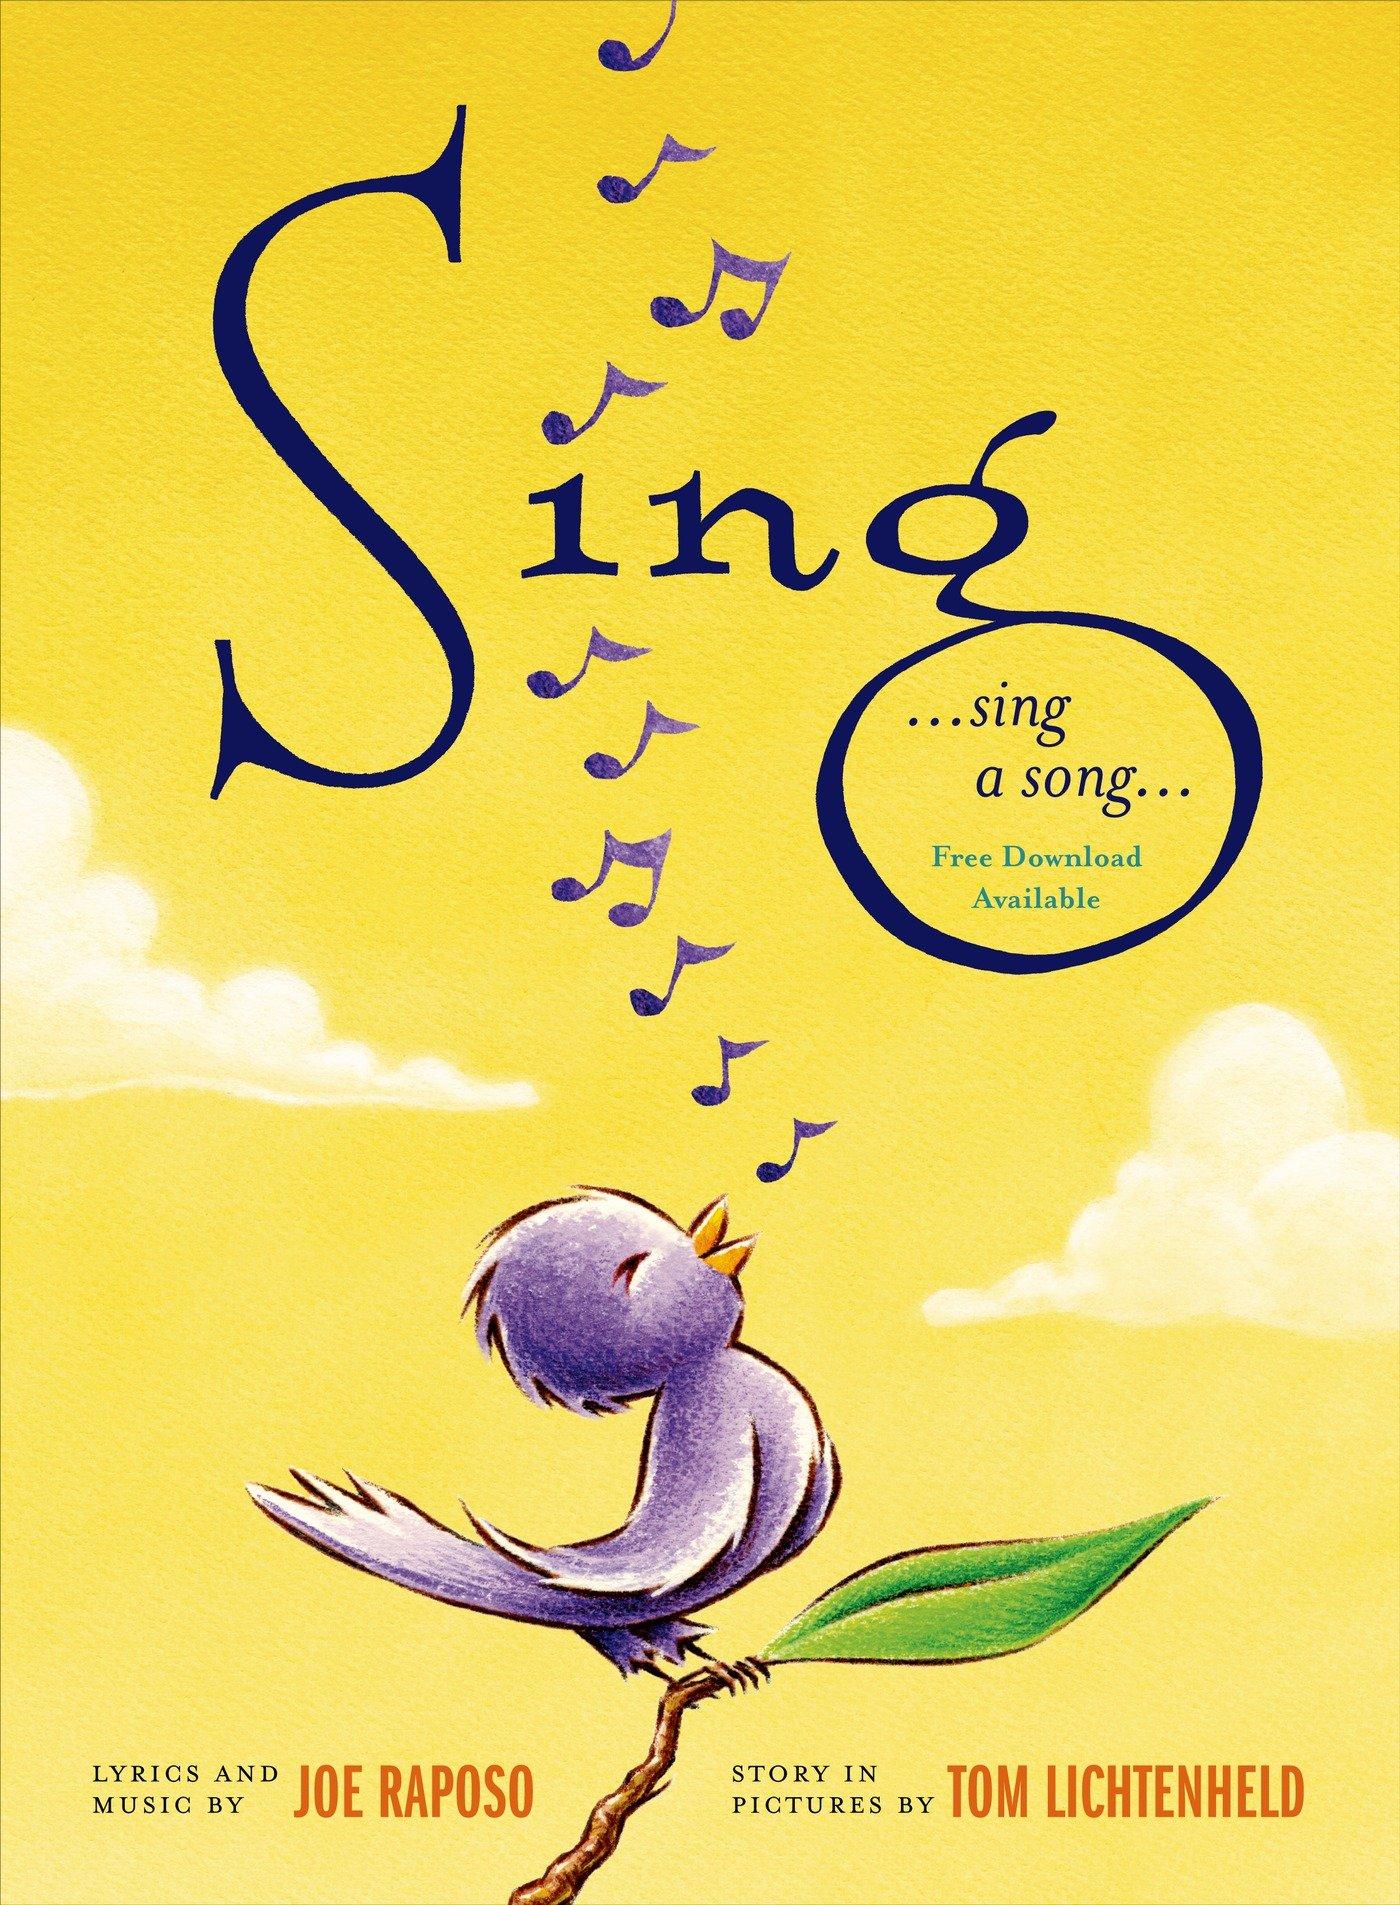 http://smile.amazon.com/Sing-Tom-Lichtenheld/dp/0805090711/ref=sr_1_1_twi_1?s=books&ie=UTF8&qid=1417145451&sr=1-1&keywords=sing